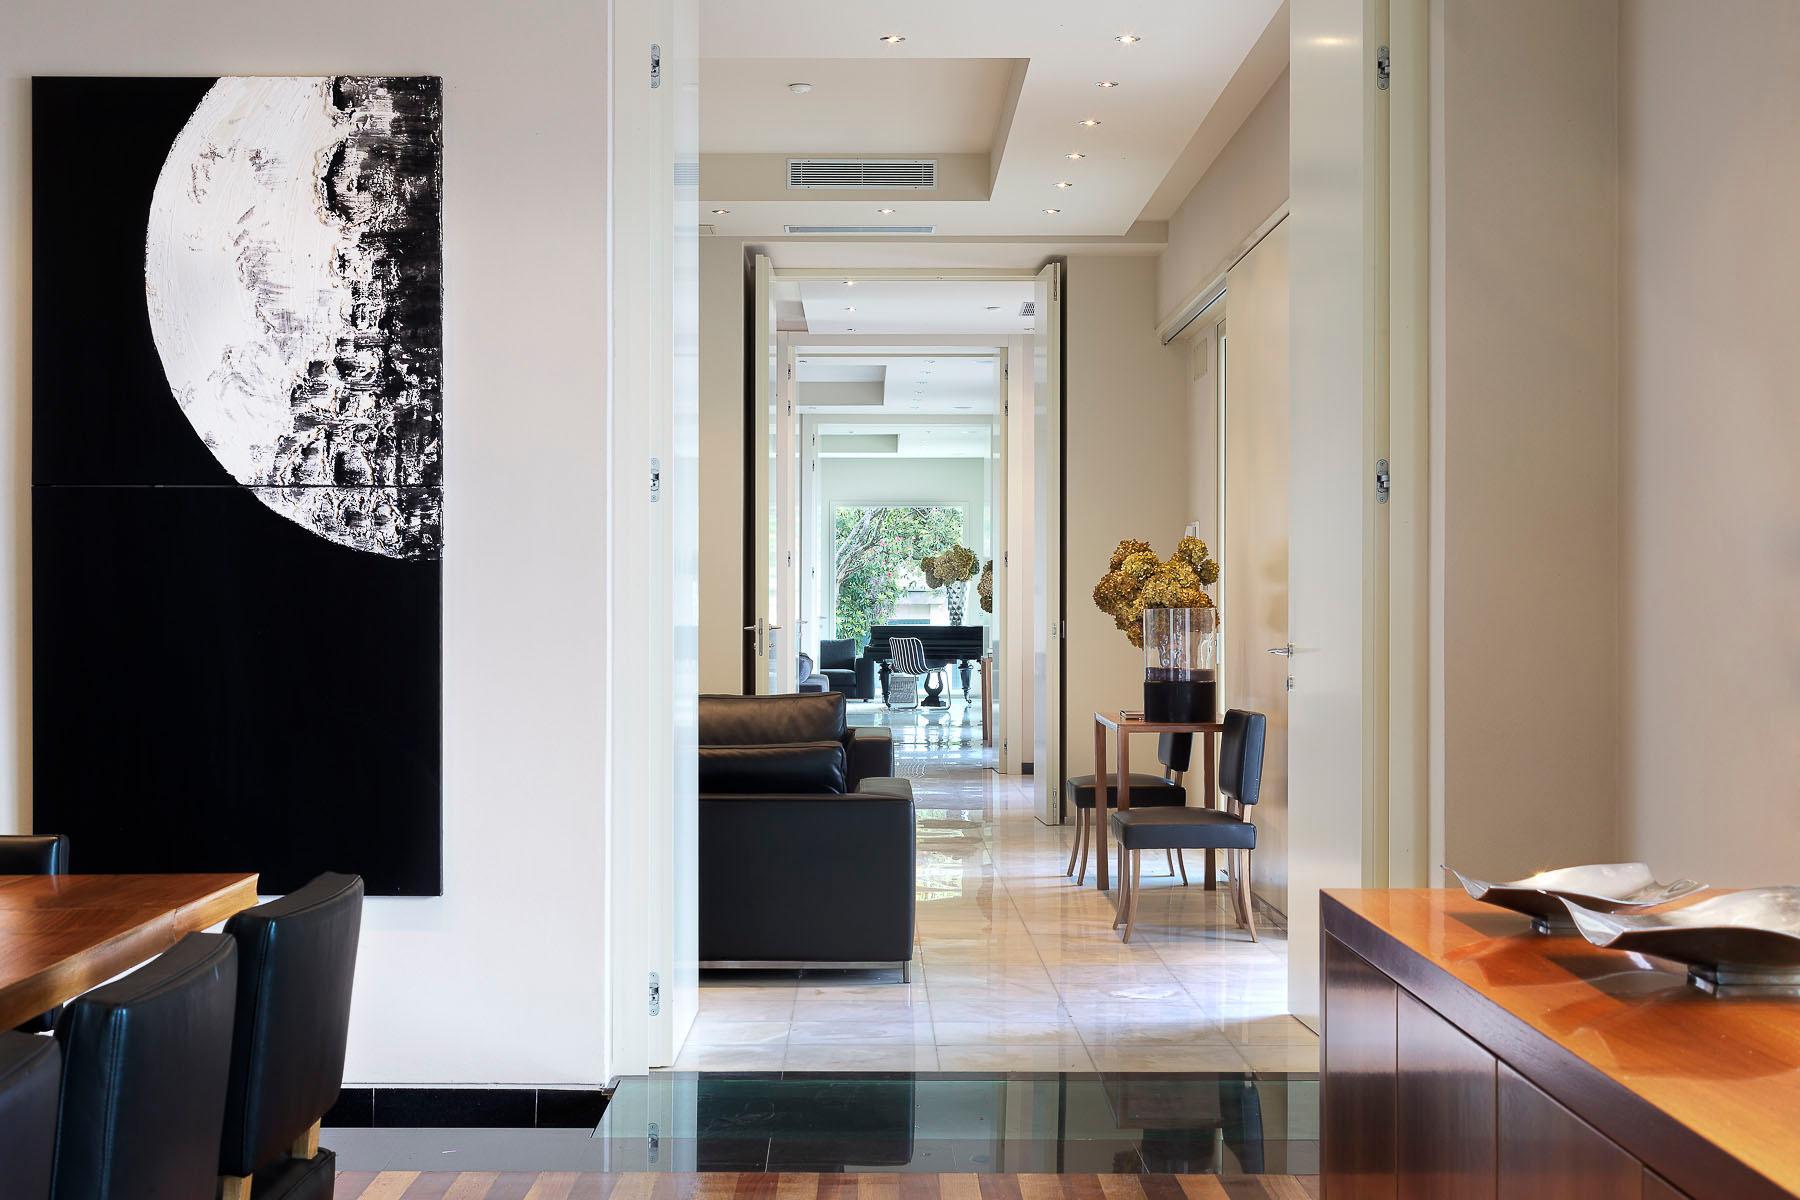 Architettura, stile e fascino a Stresa - 17